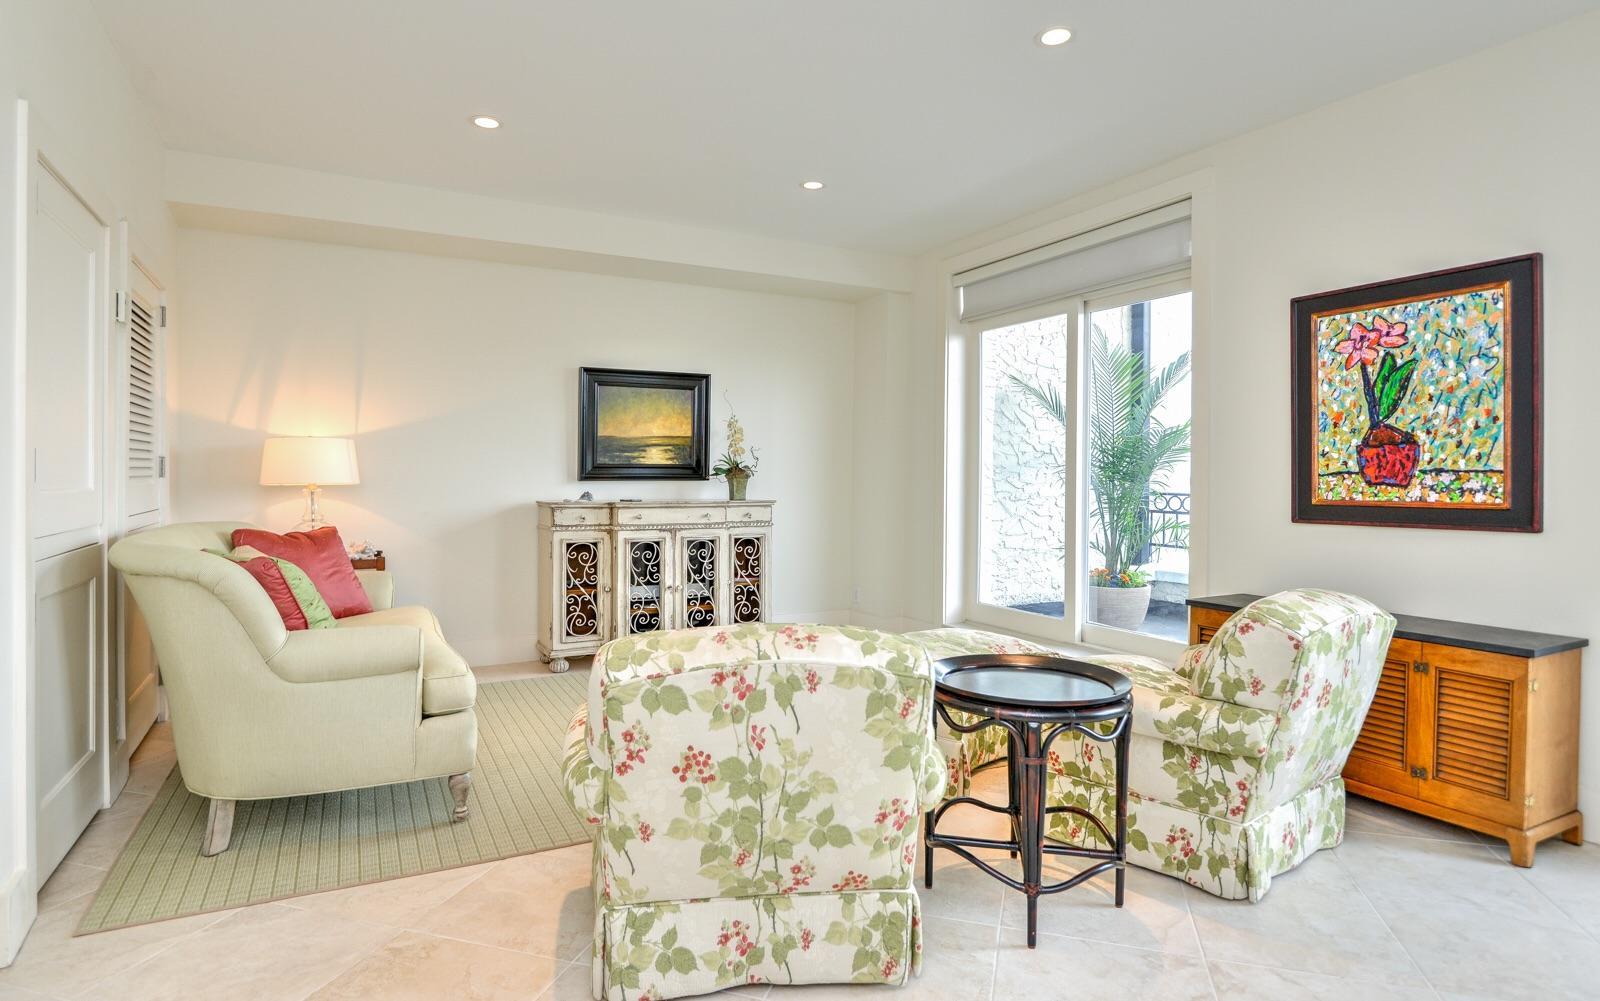 Fort Sumter House Homes For Sale - 1 King, Charleston, SC - 15